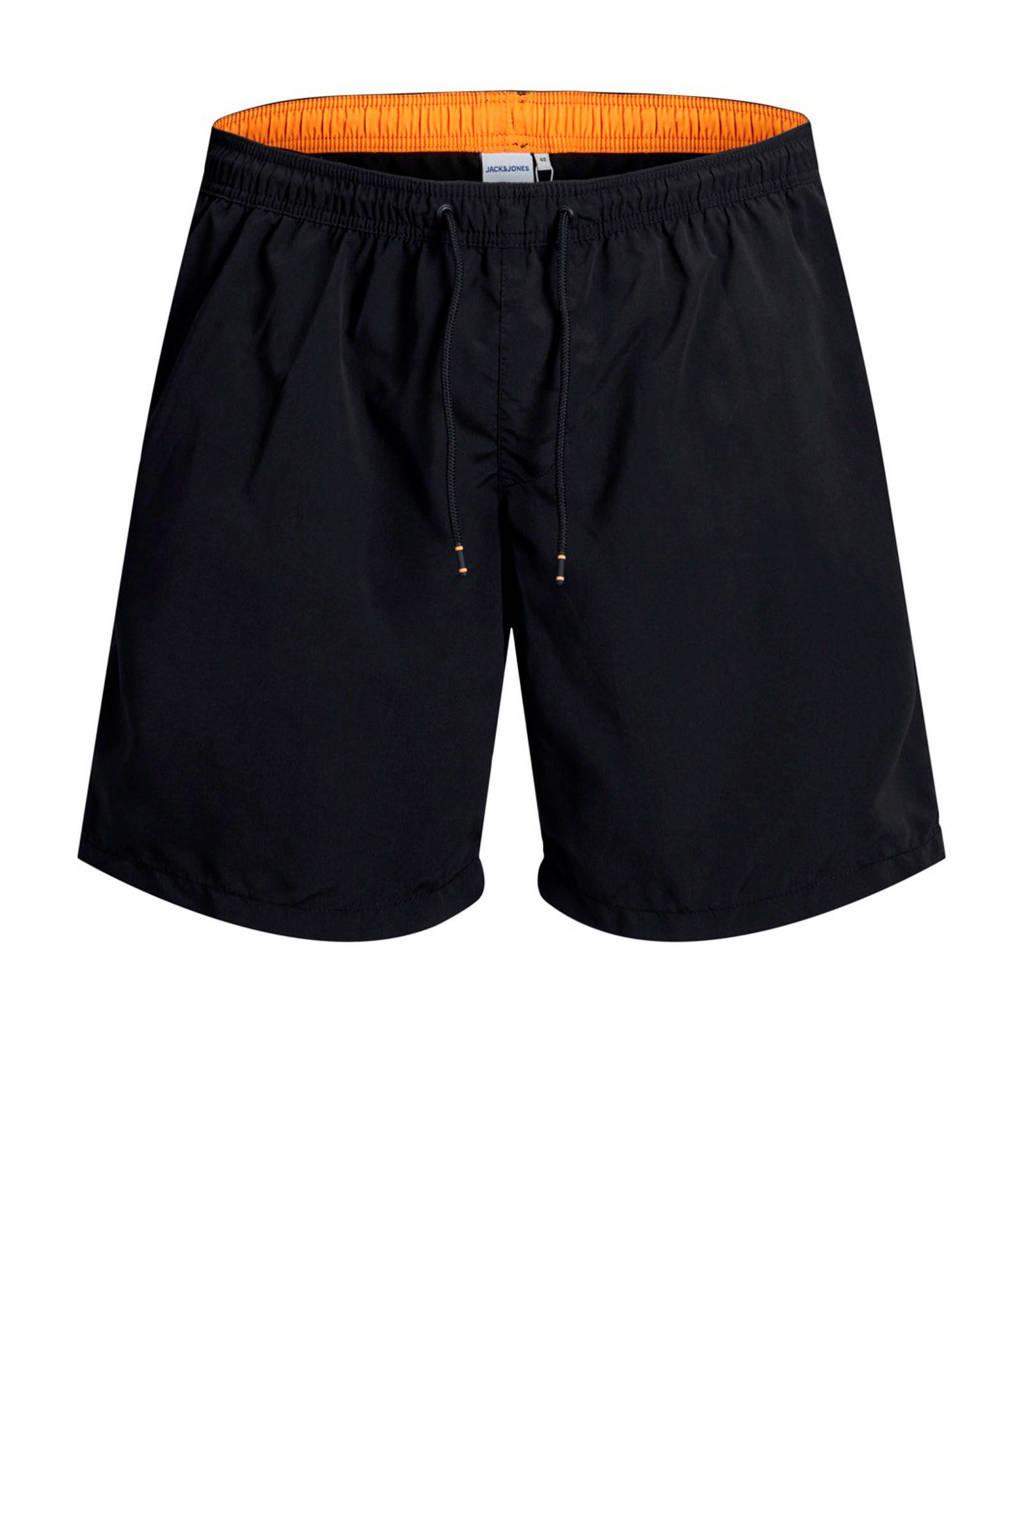 Jack & Jones Plus Size zwemshort zwart, Zwart